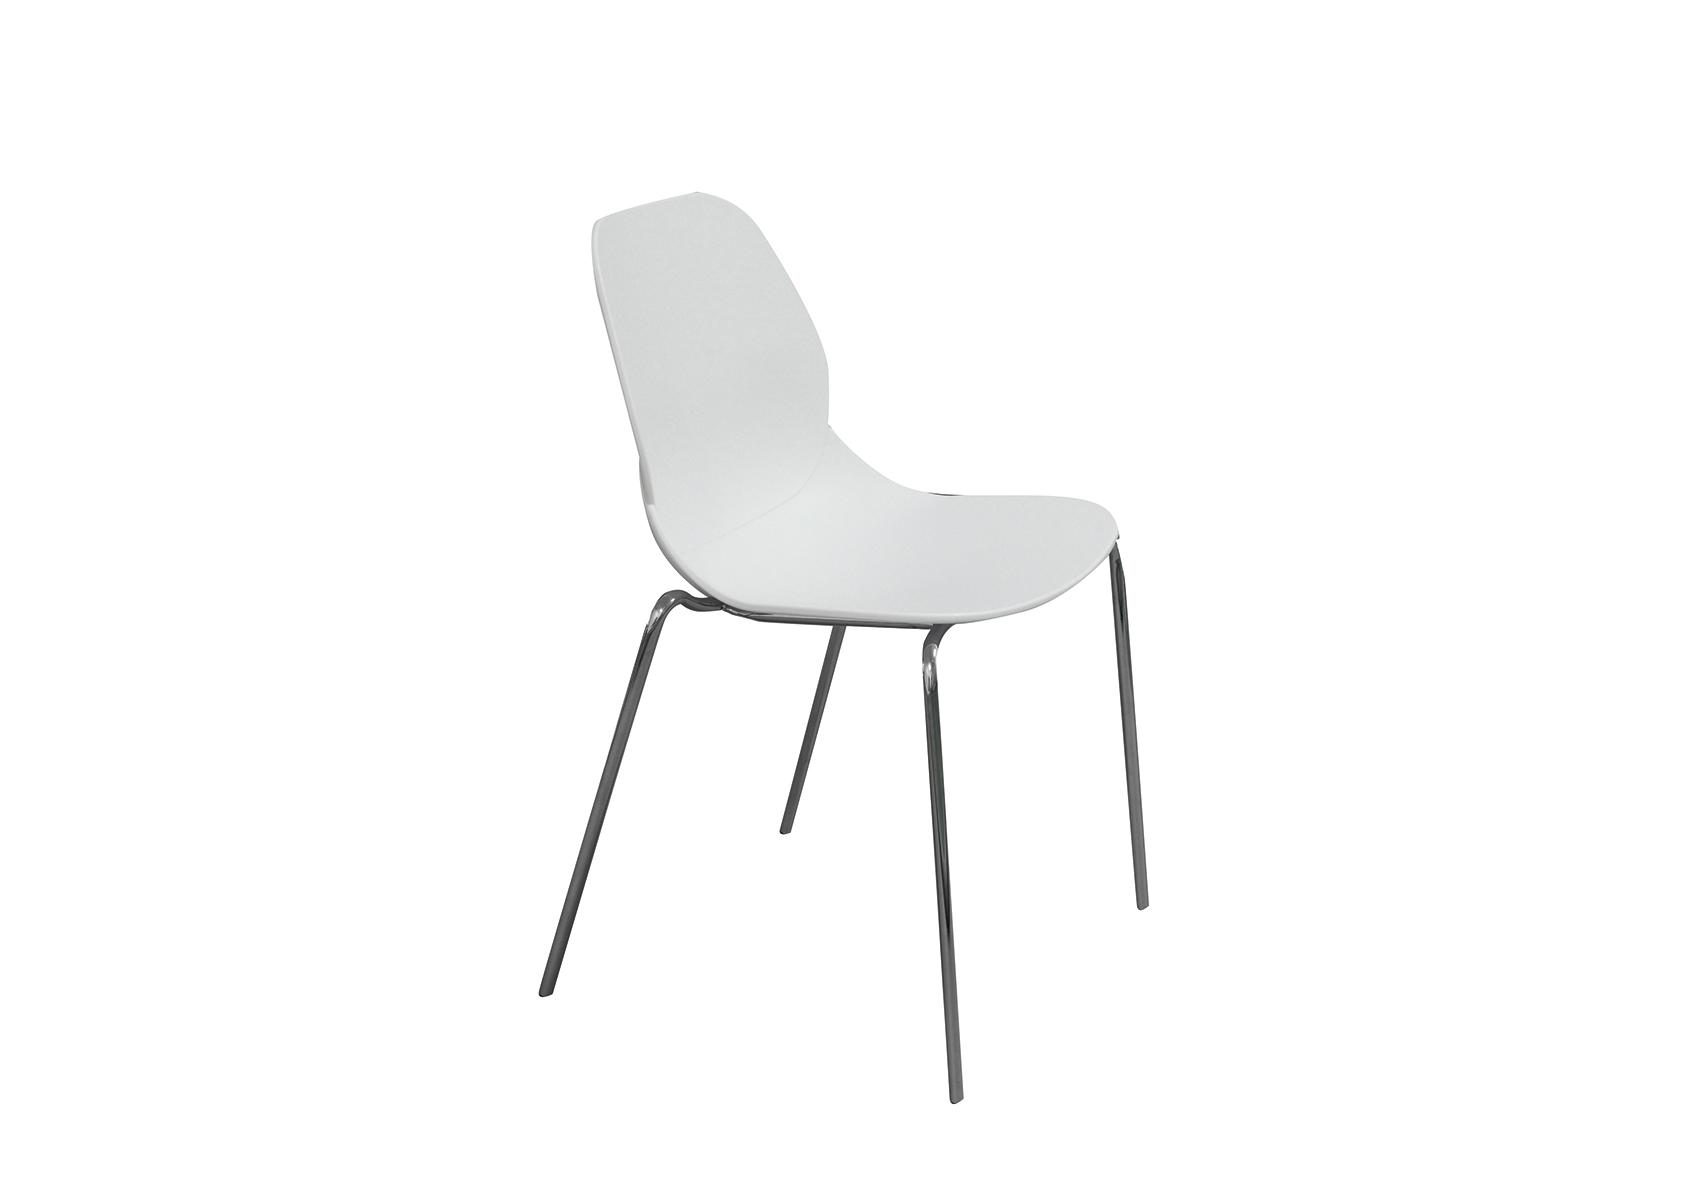 Europe Style Стул CT-615 белый europe style стол dt 903 белый